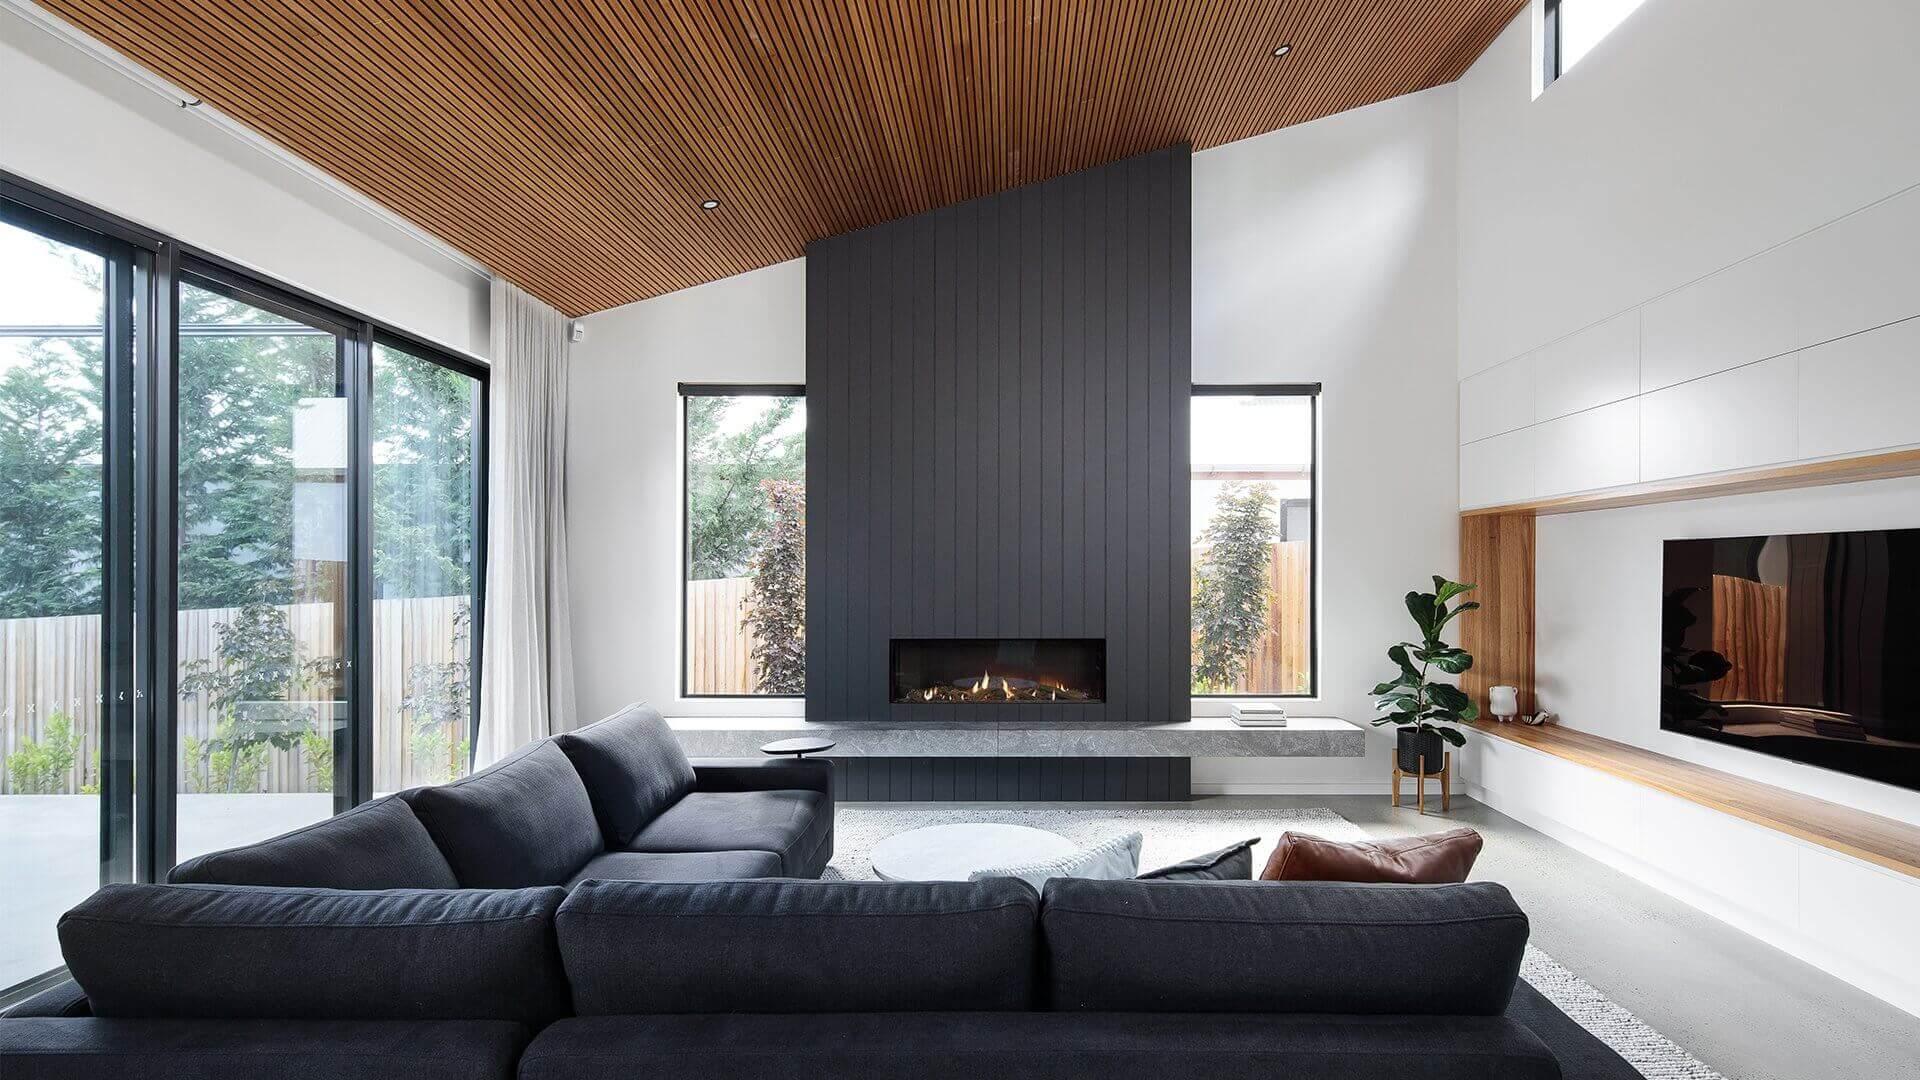 Inbuilt wood heater in large, modern living room